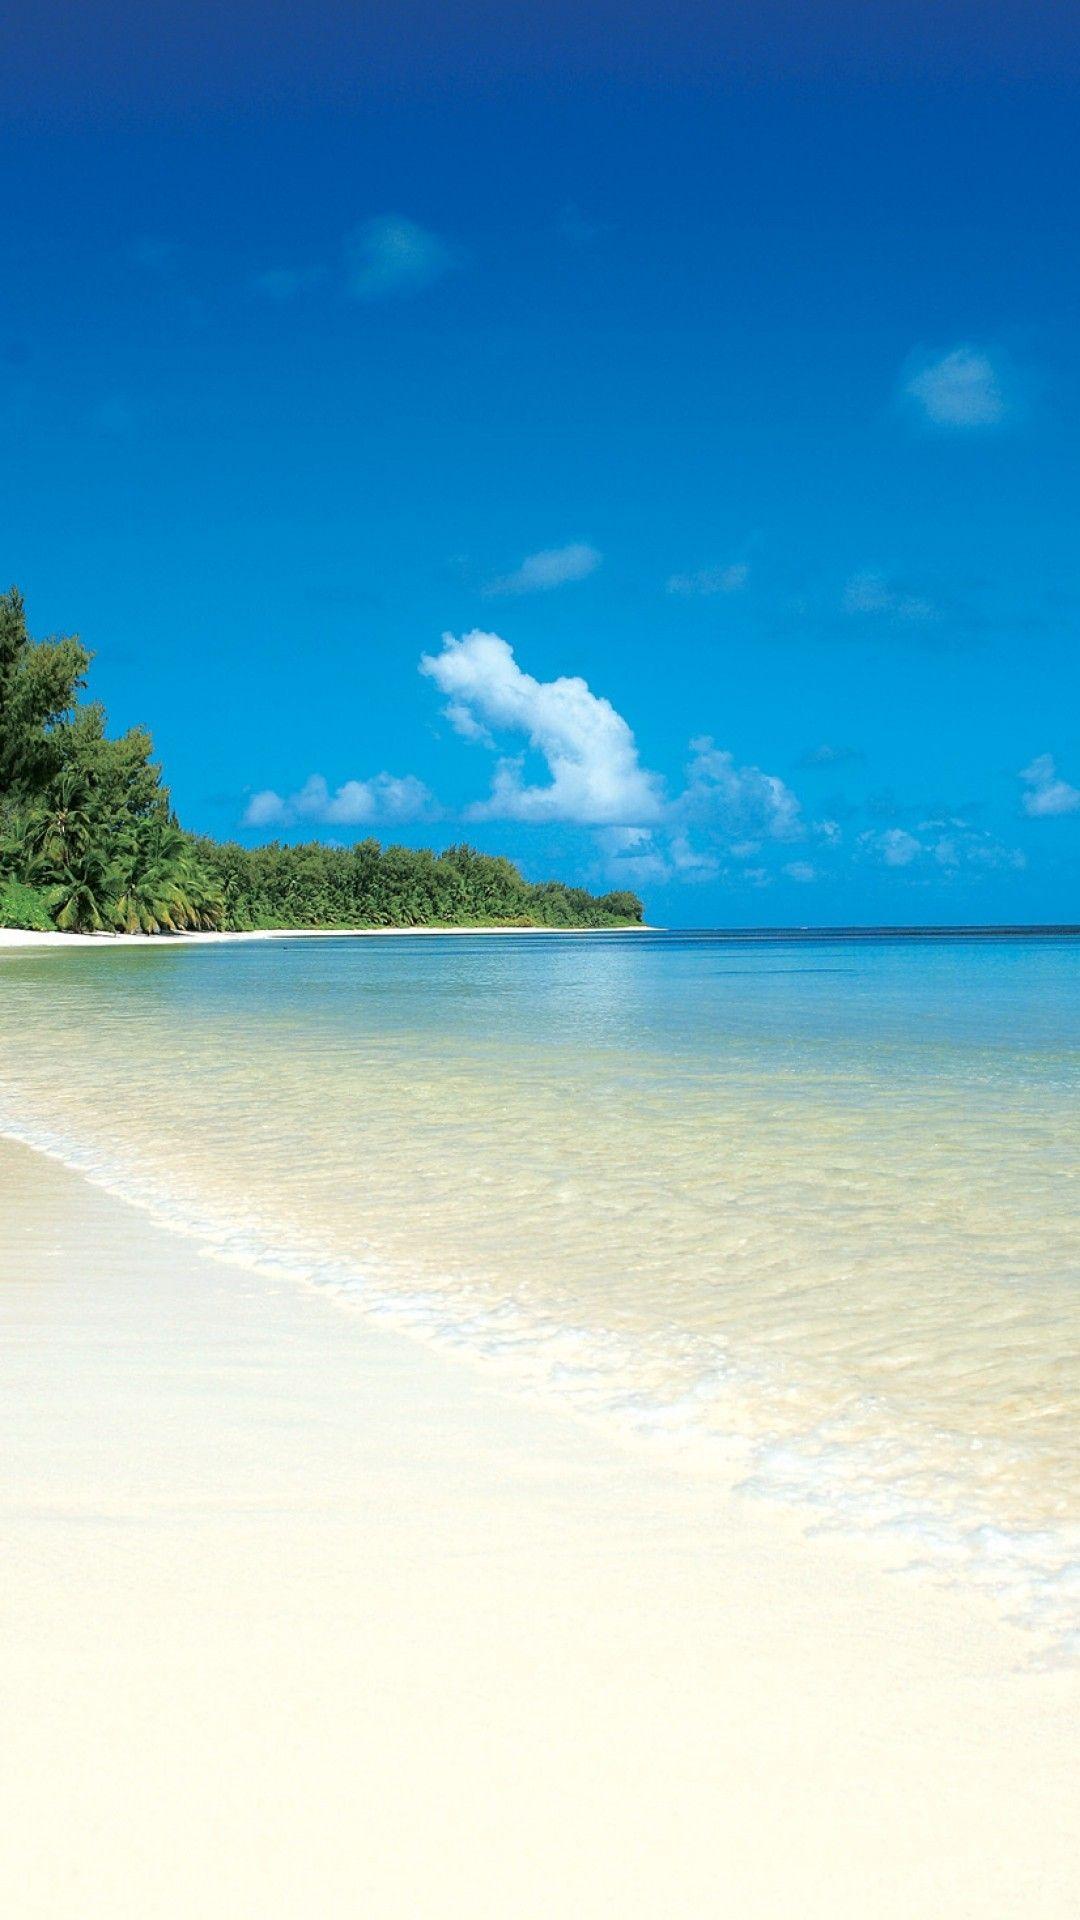 White Sand Tropical Island Beach Smartphone Wallpaper and 1080x1920